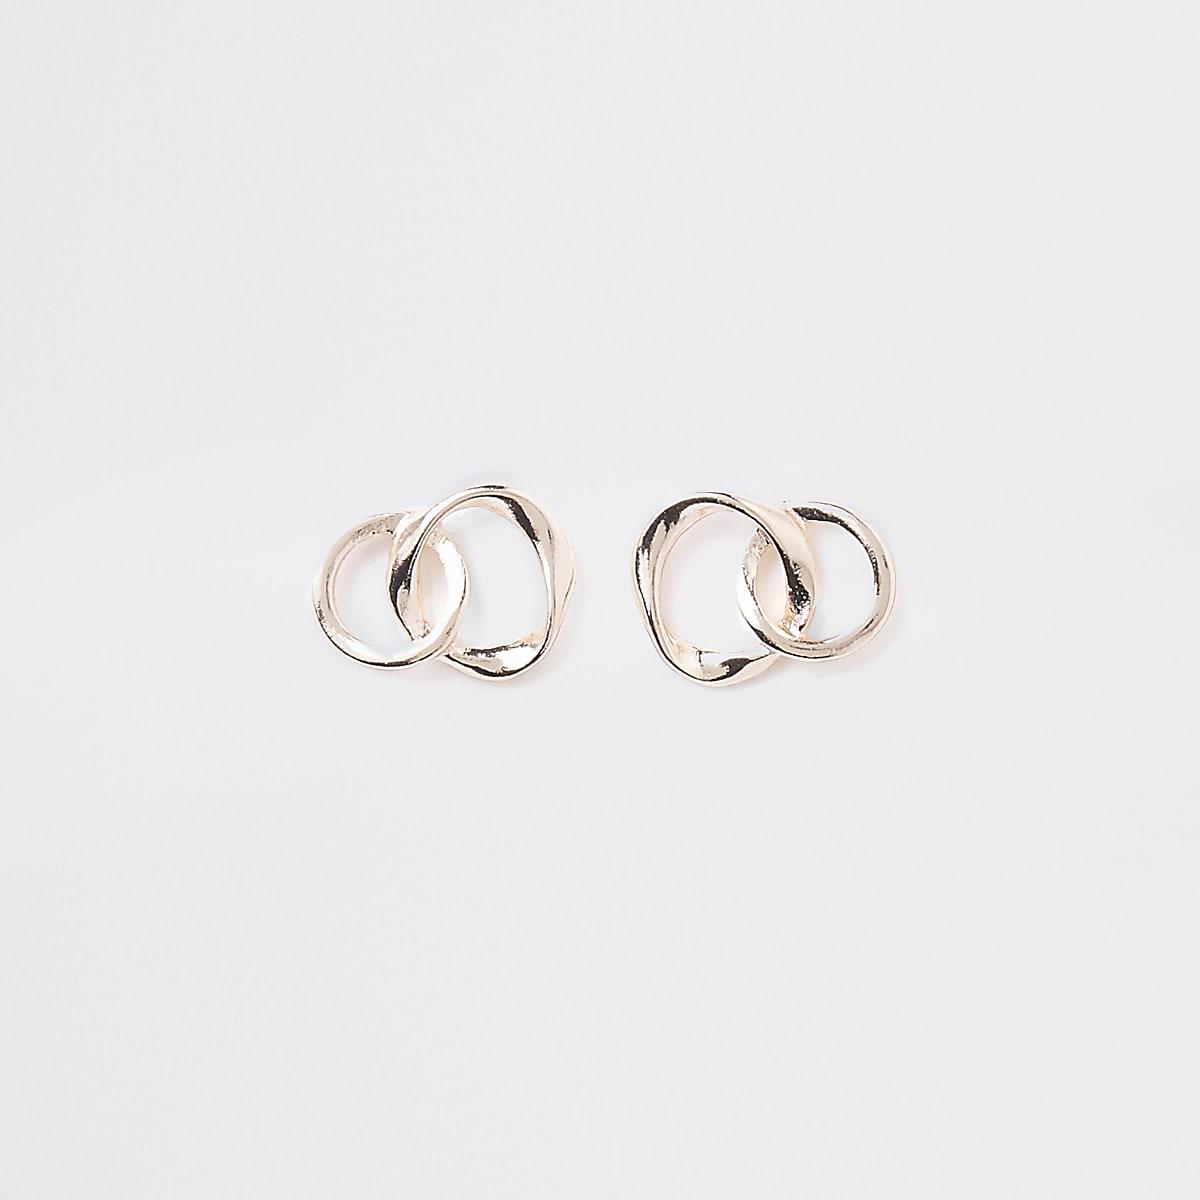 Rose gold wavy interlink stud earrings